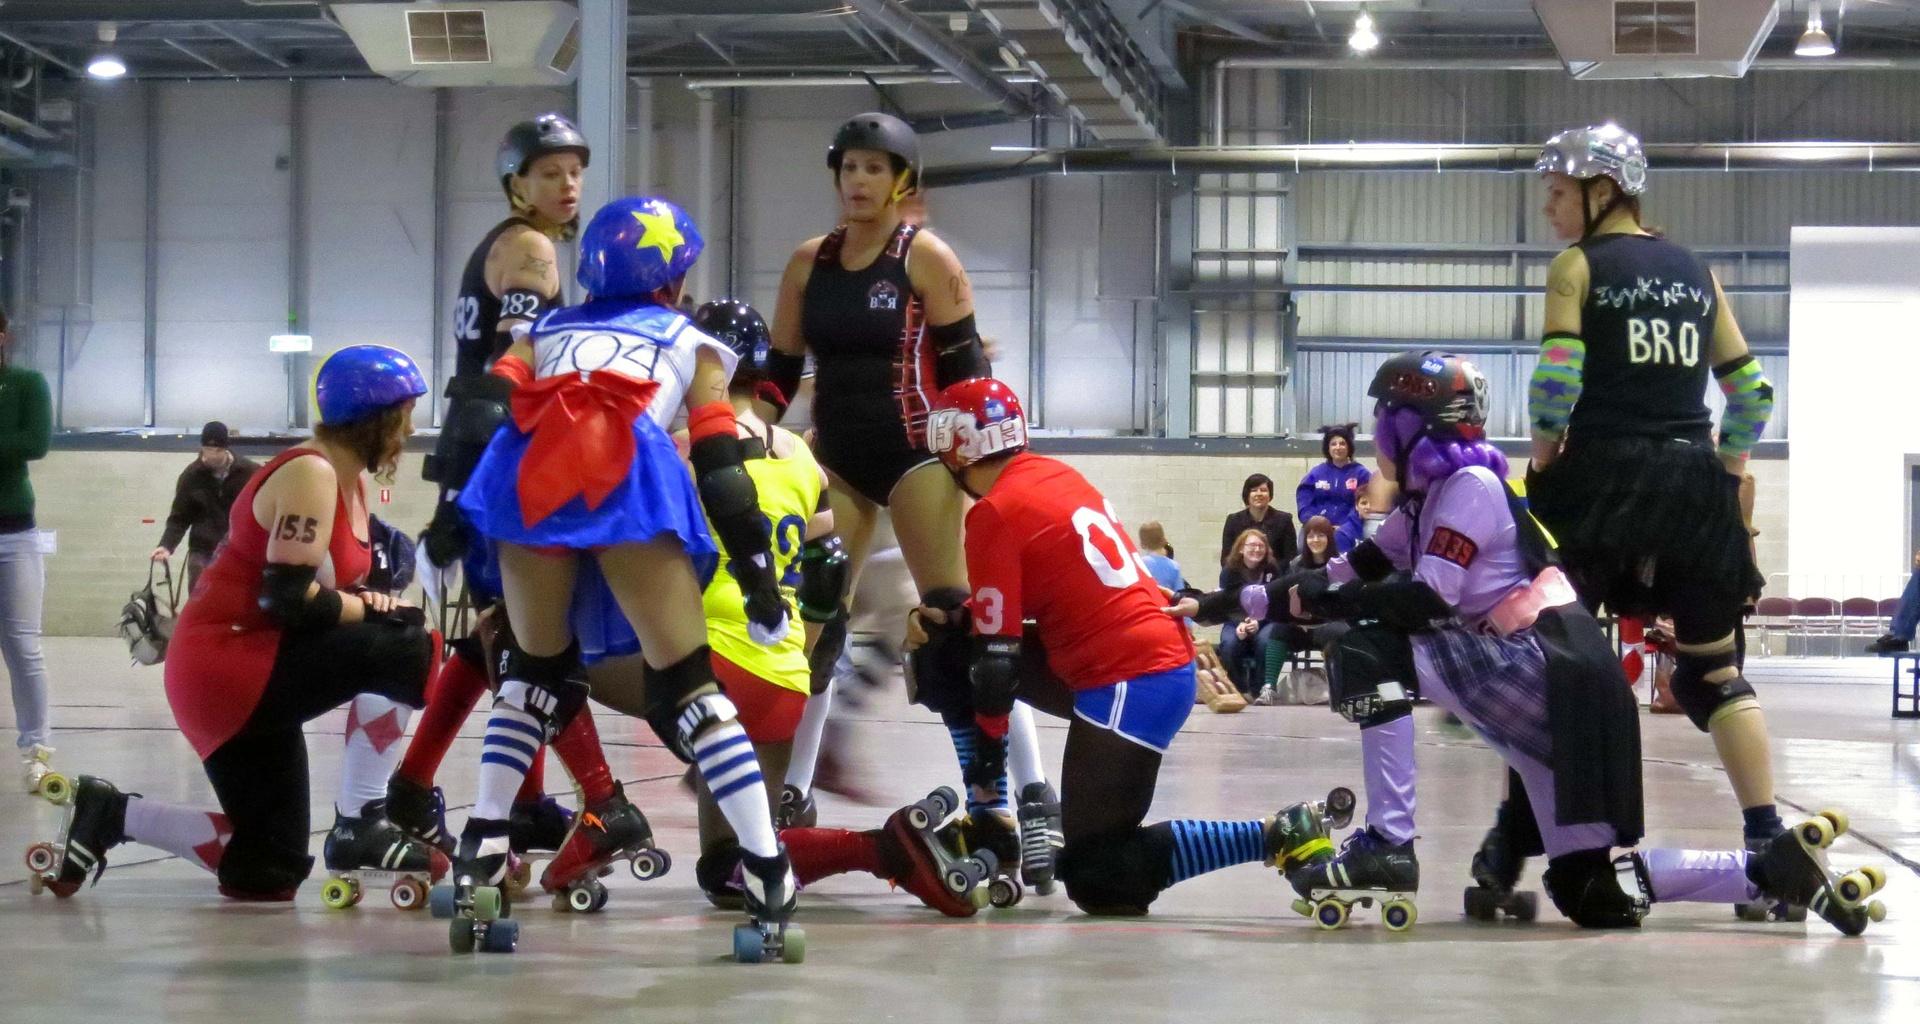 Roller skates adelaide - Roller Skates Adelaide 17